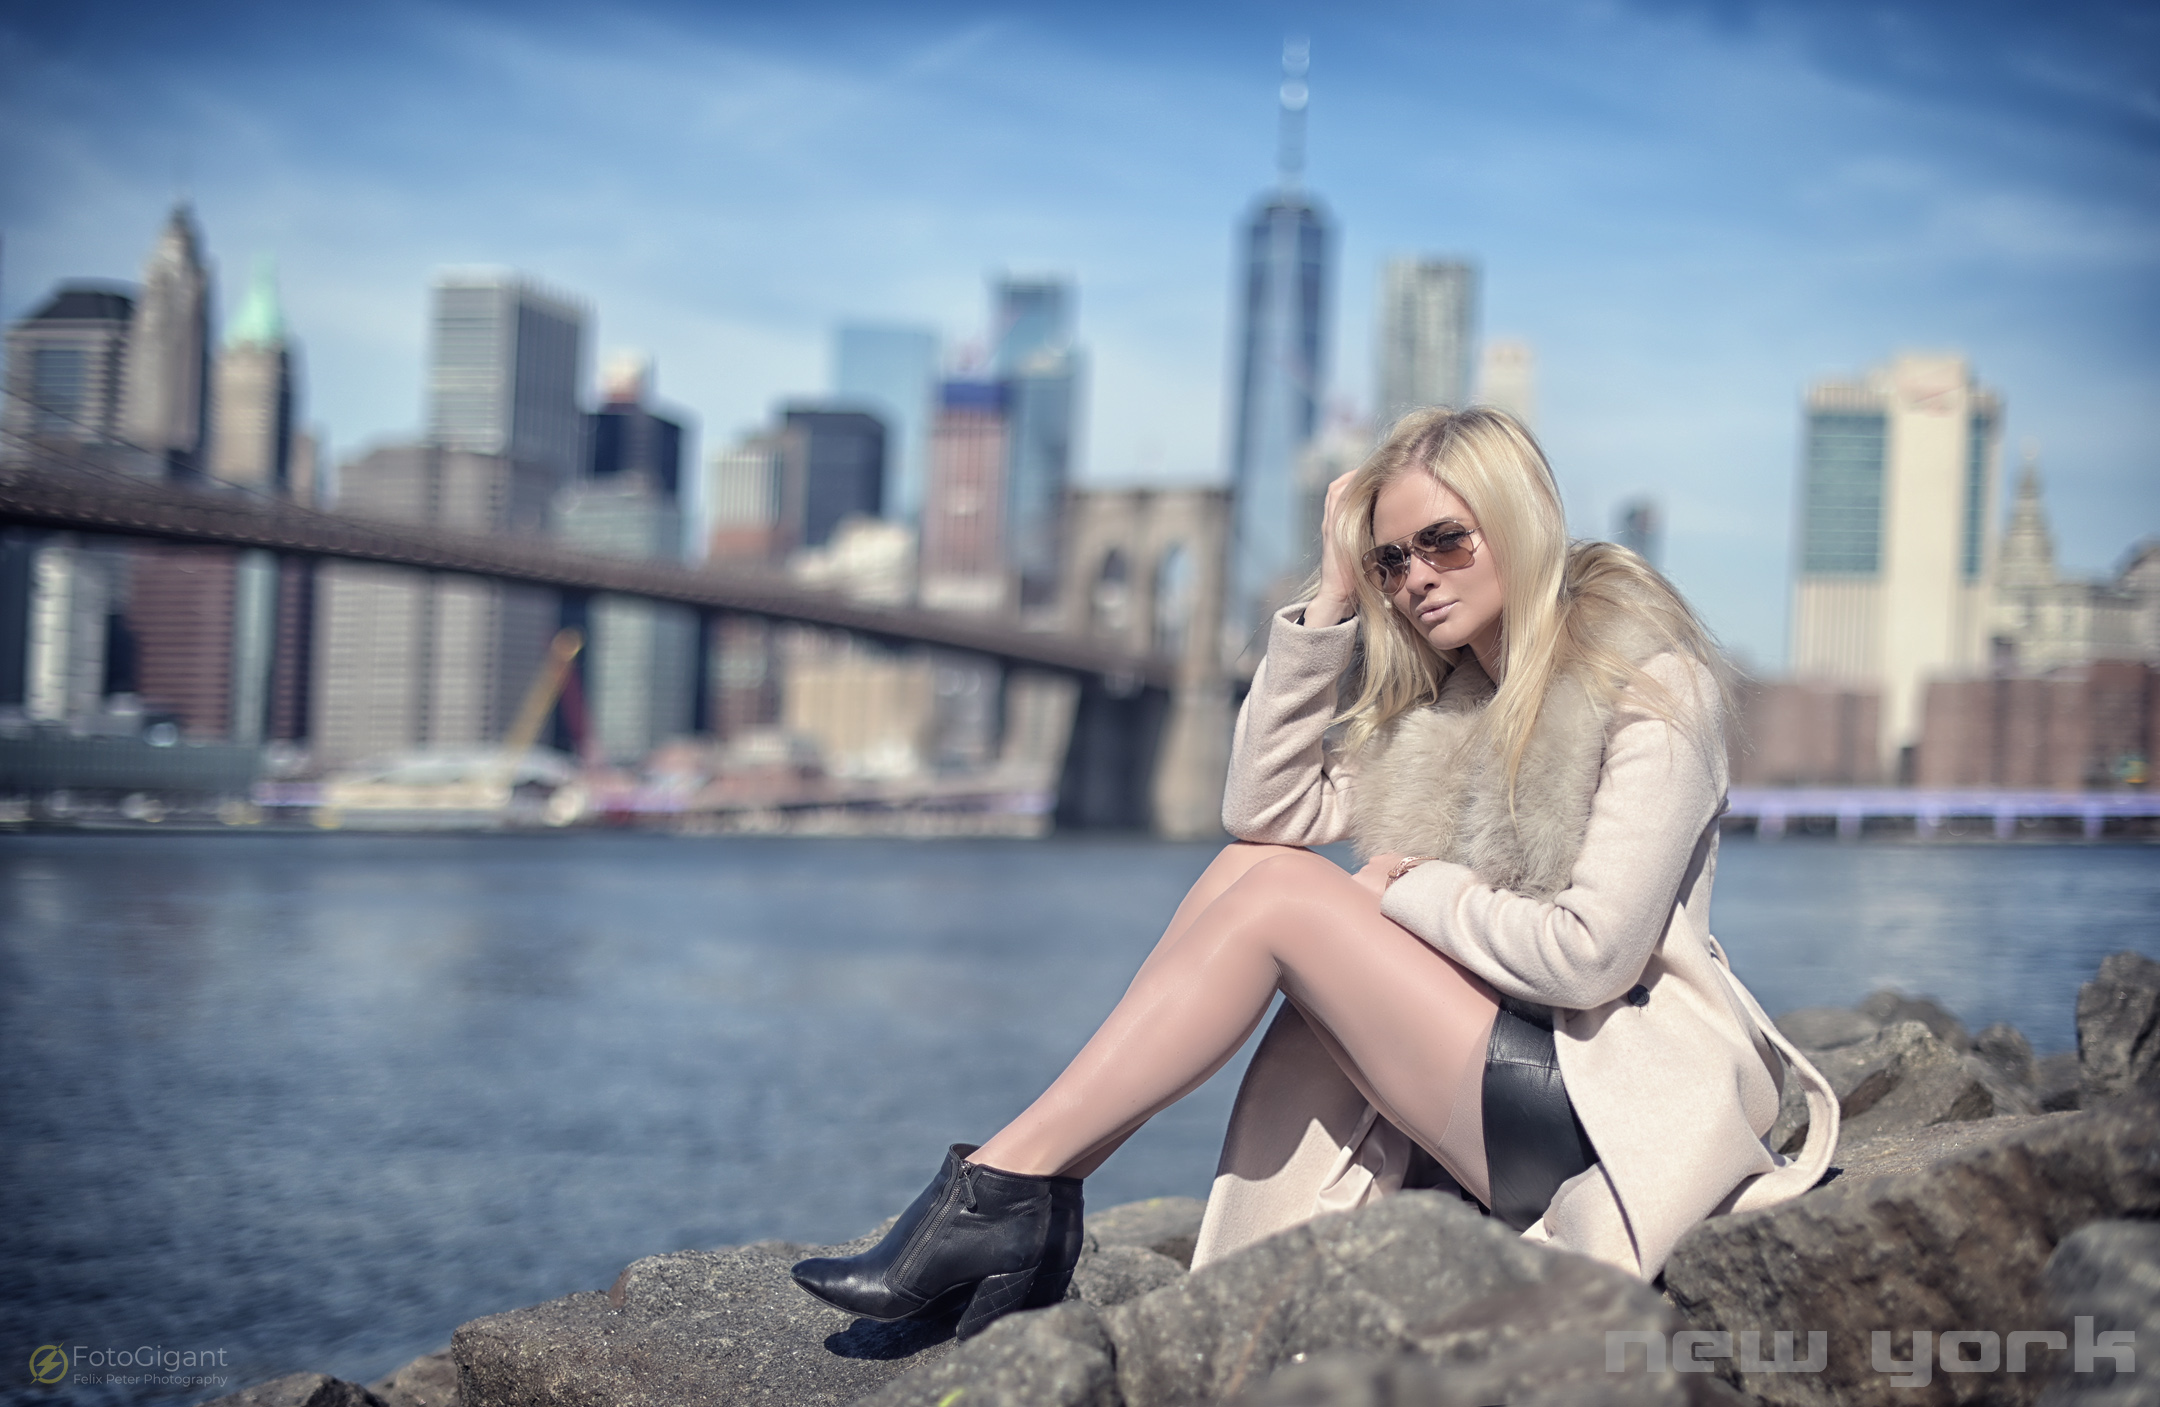 NewYork_JuliaKolomiyets_Fashionphotography_05.jpg